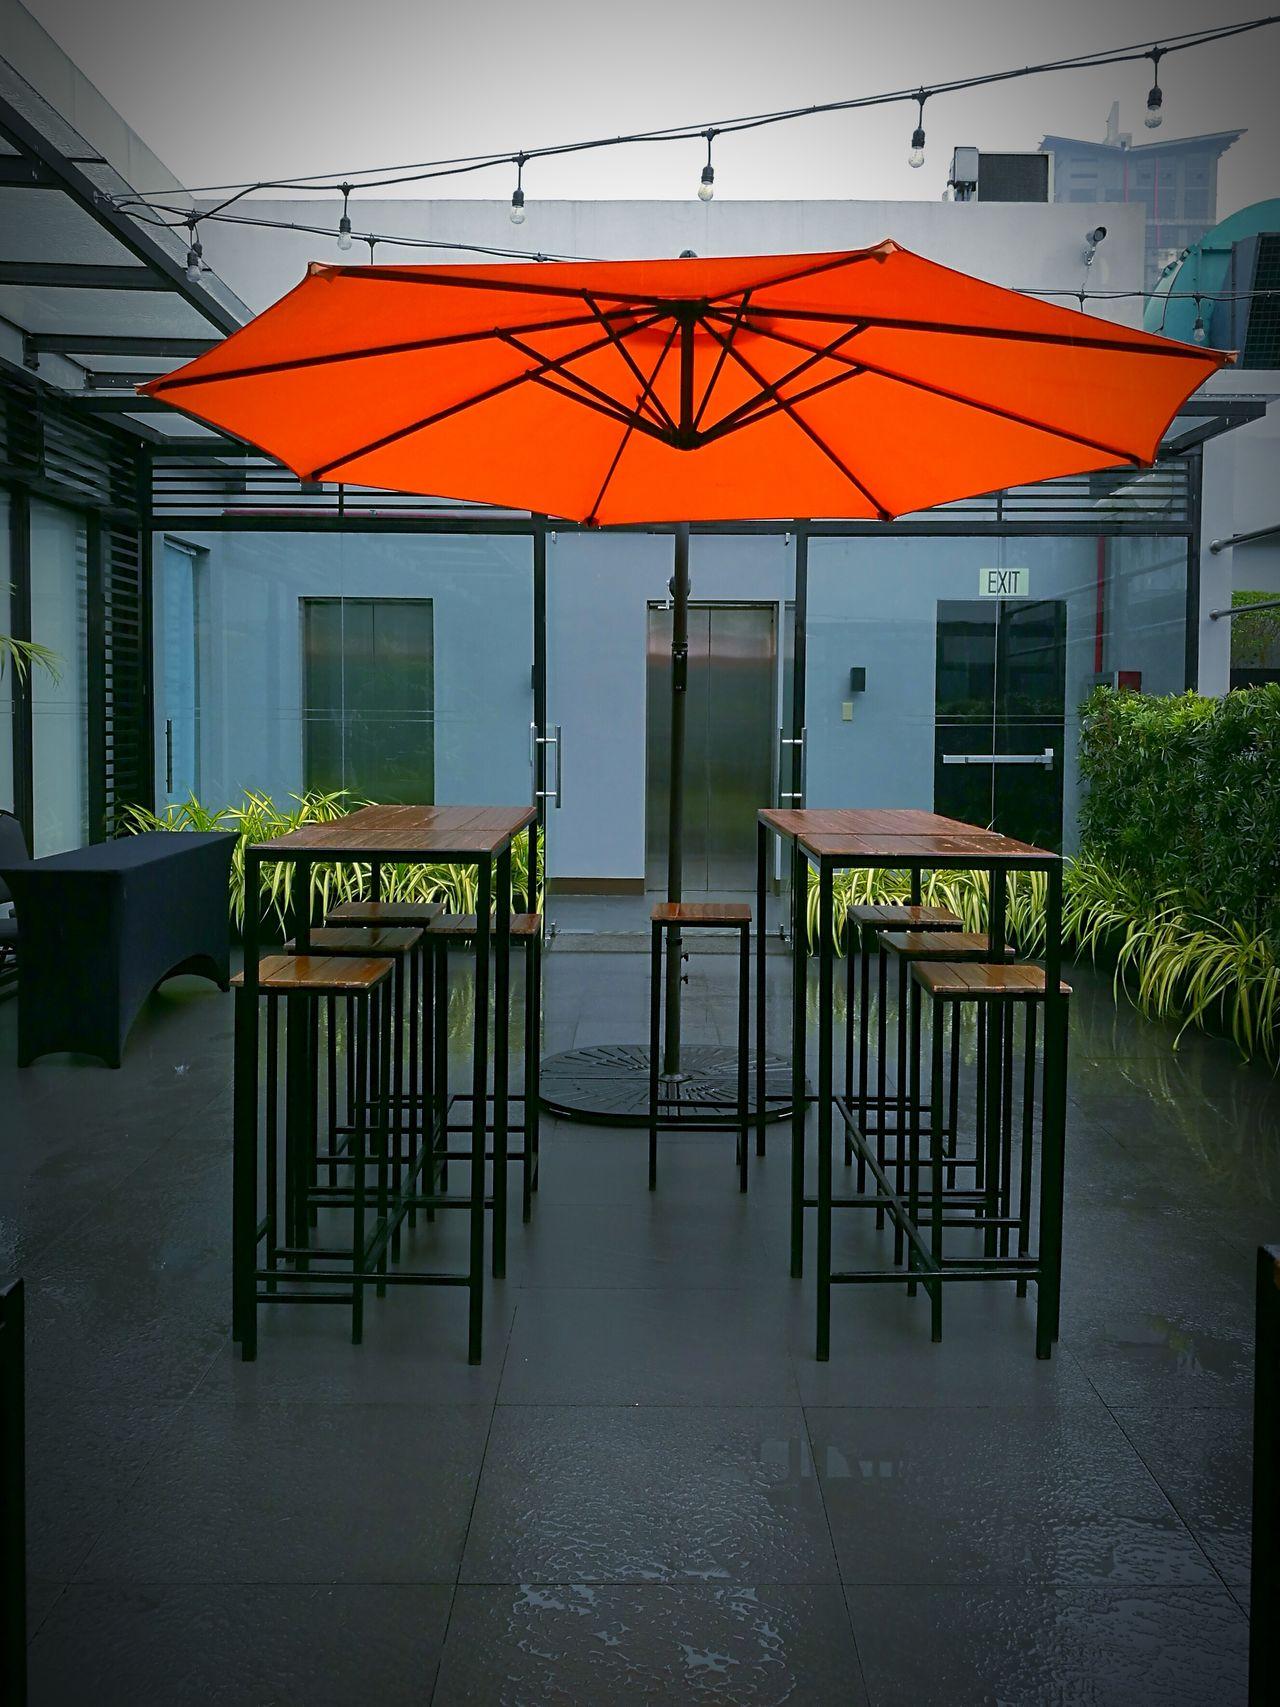 Rainy Weather Chair No People Outdoors Building Terrace P9 Huawei Orangeumbrella Umbrella